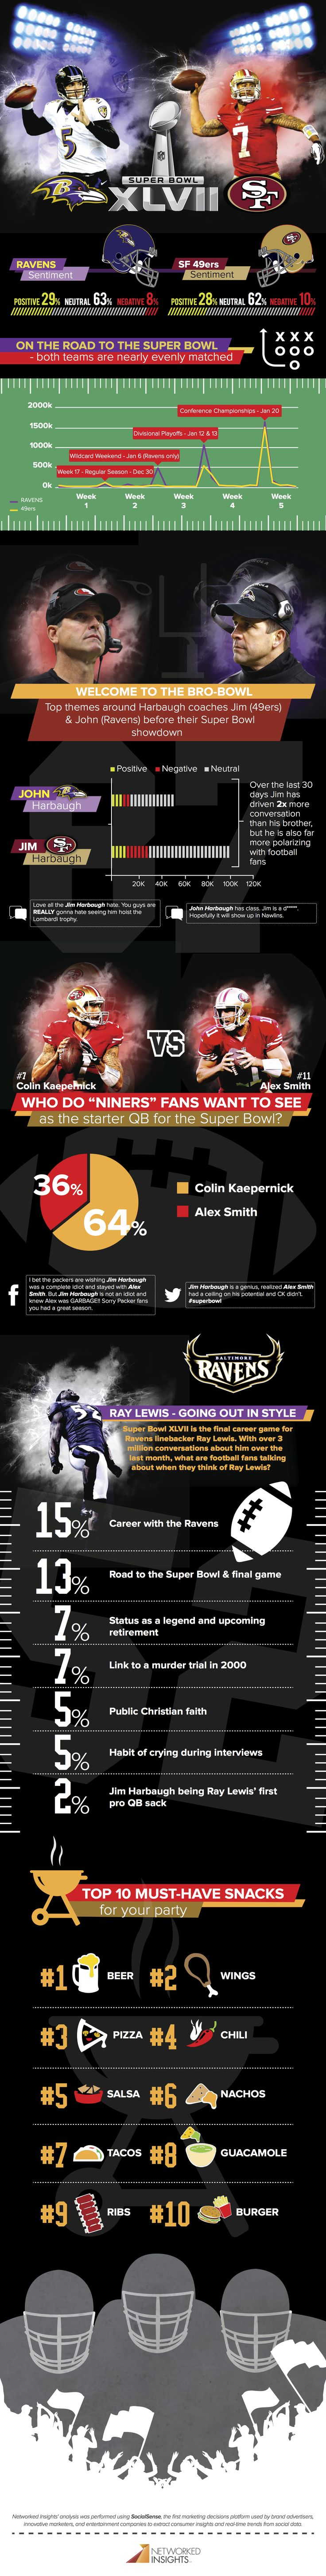 Super Bowl XLVII and Social Media